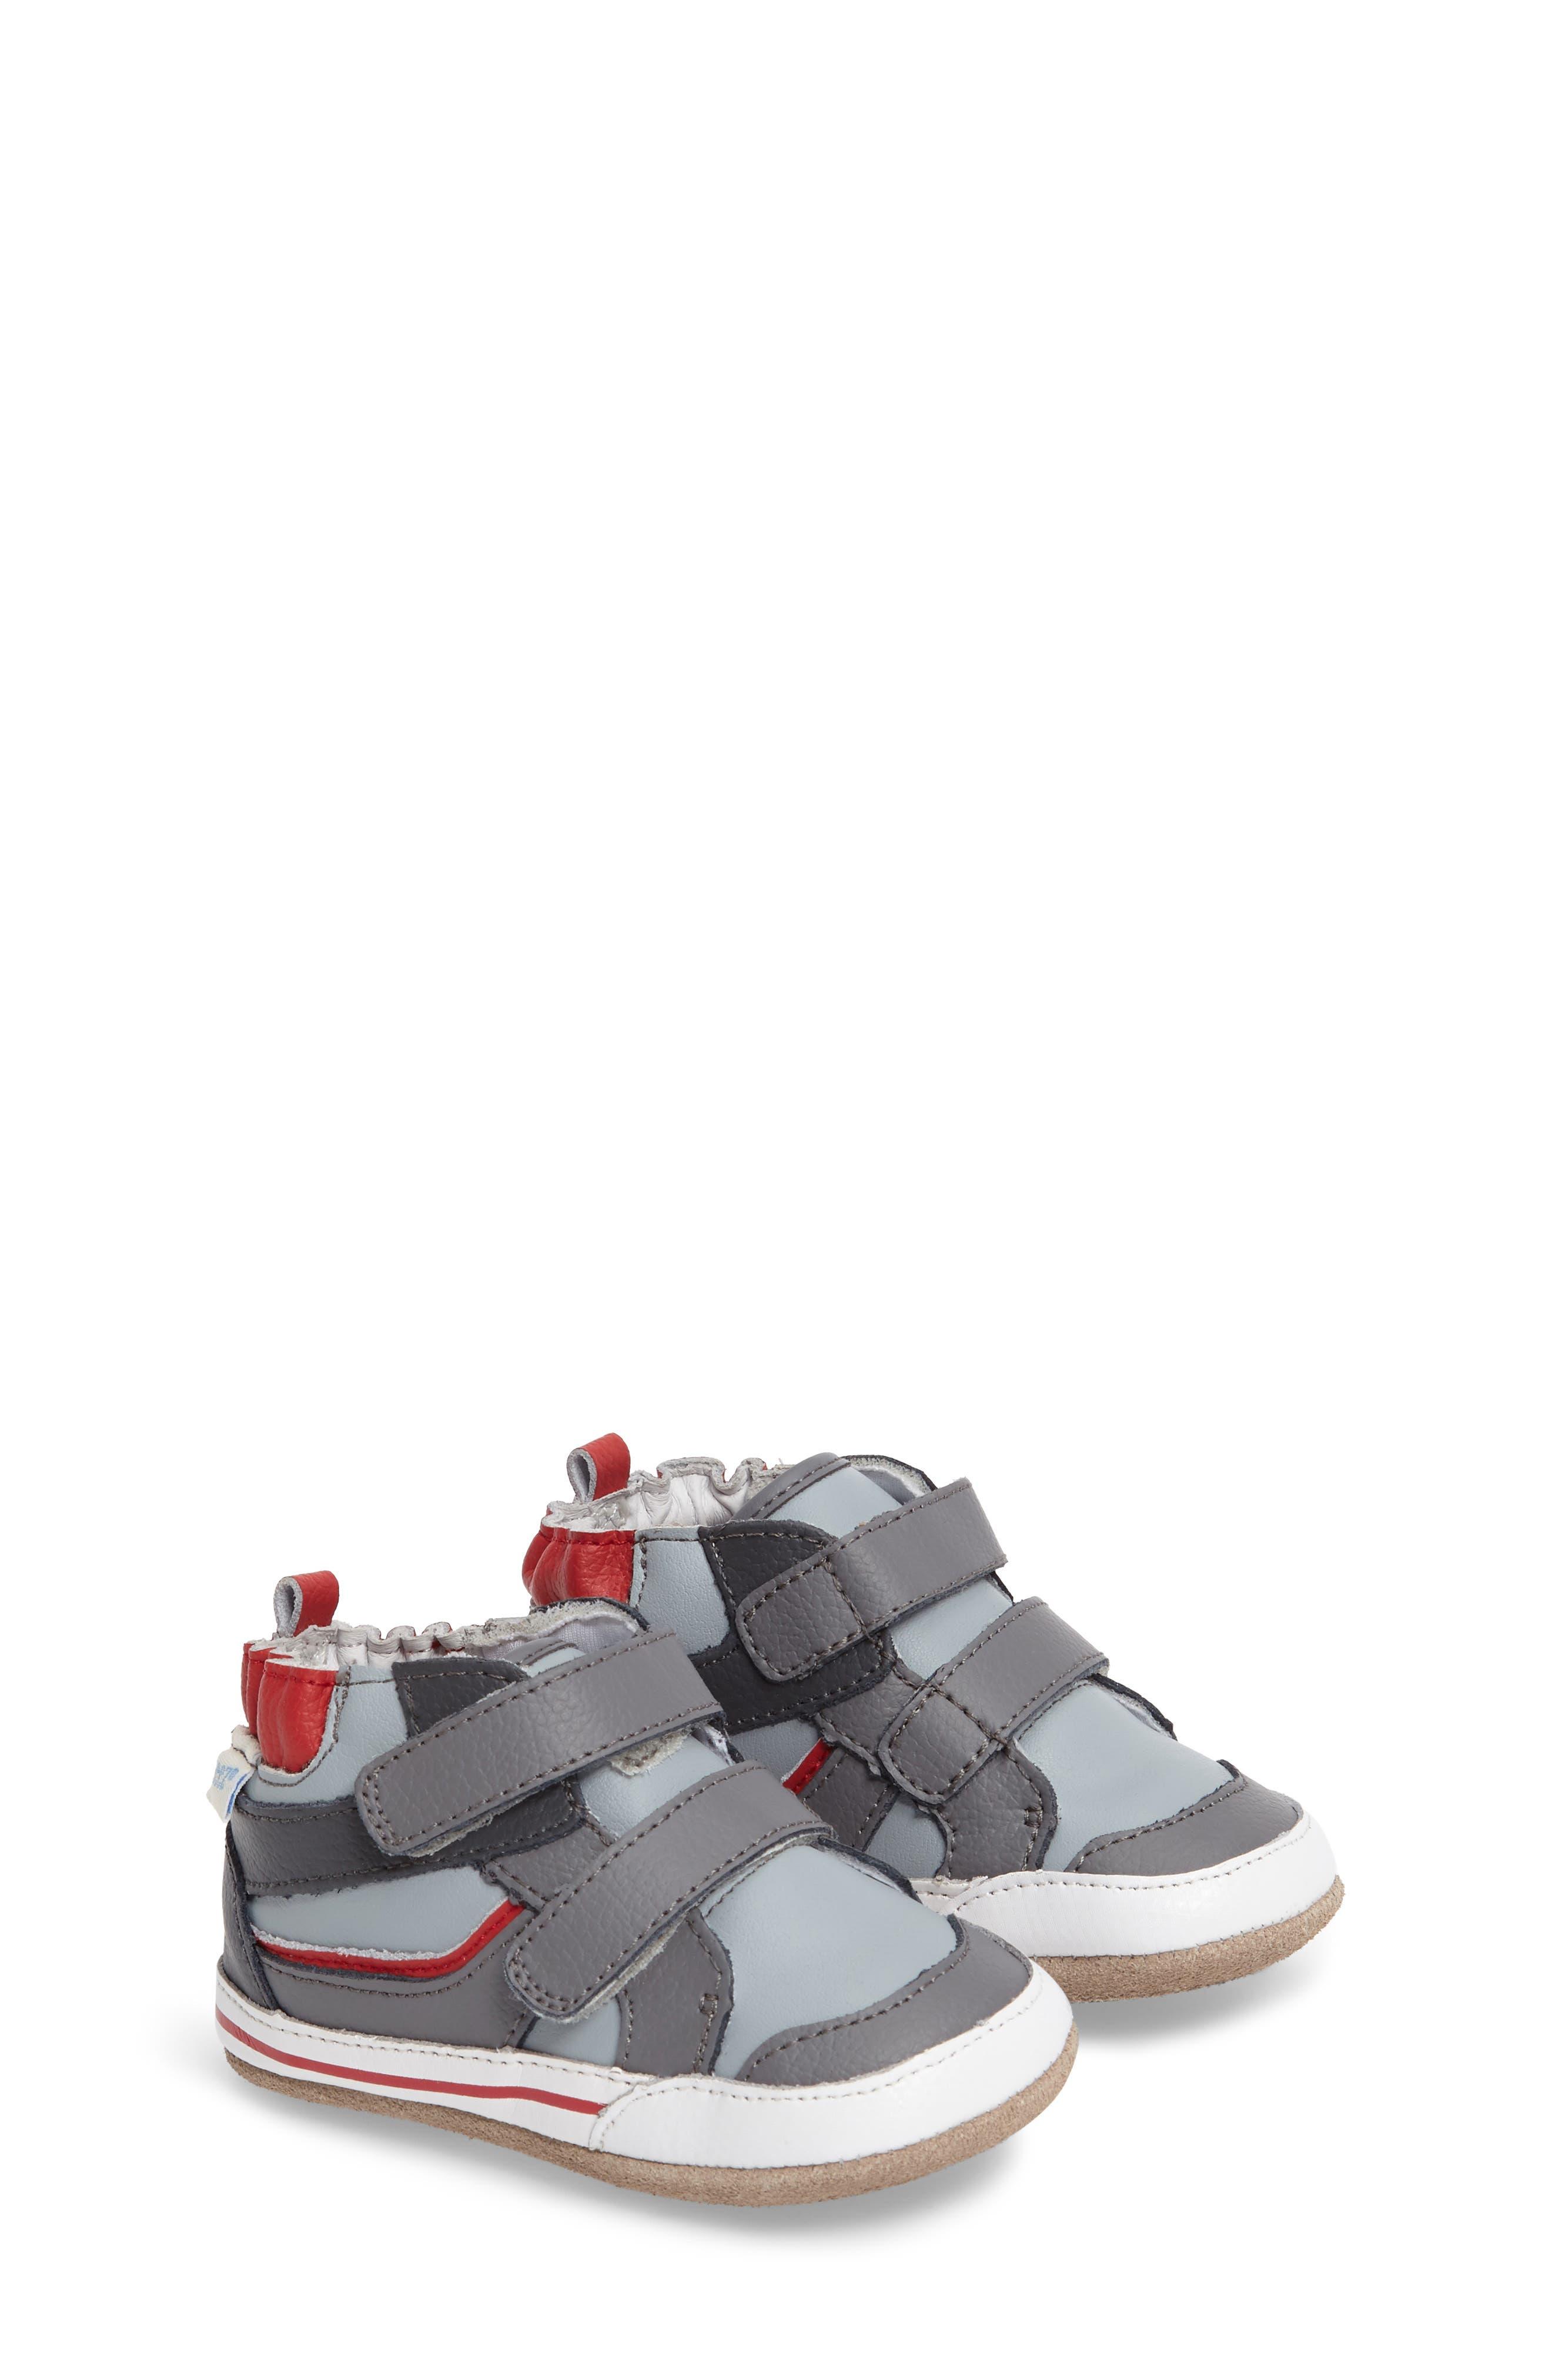 Greg Crib Shoe,                             Main thumbnail 1, color,                             020